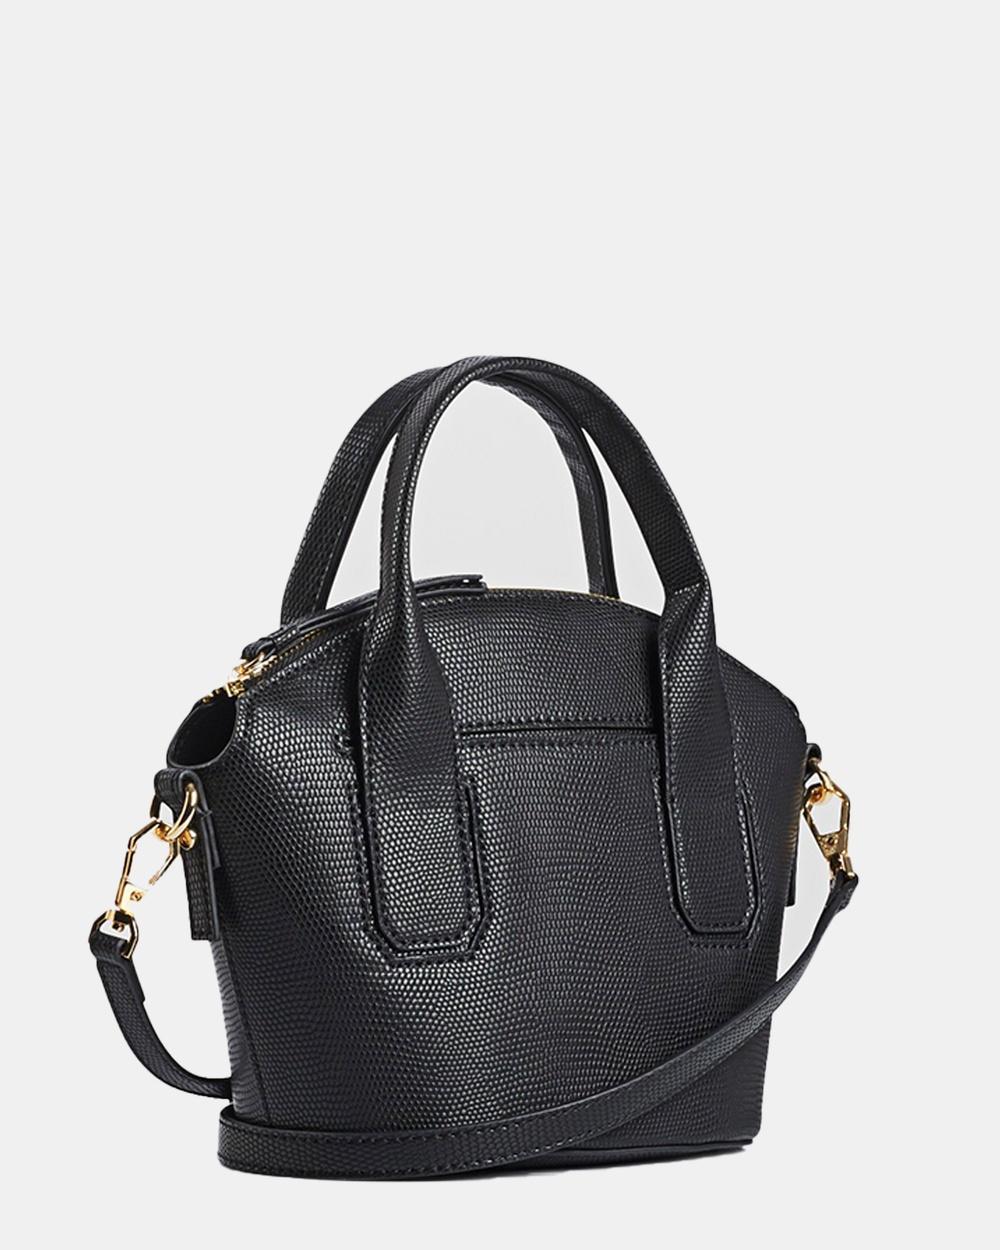 Naturalizer Kiley Shoulder Bag Handbags Black Handbags Australia